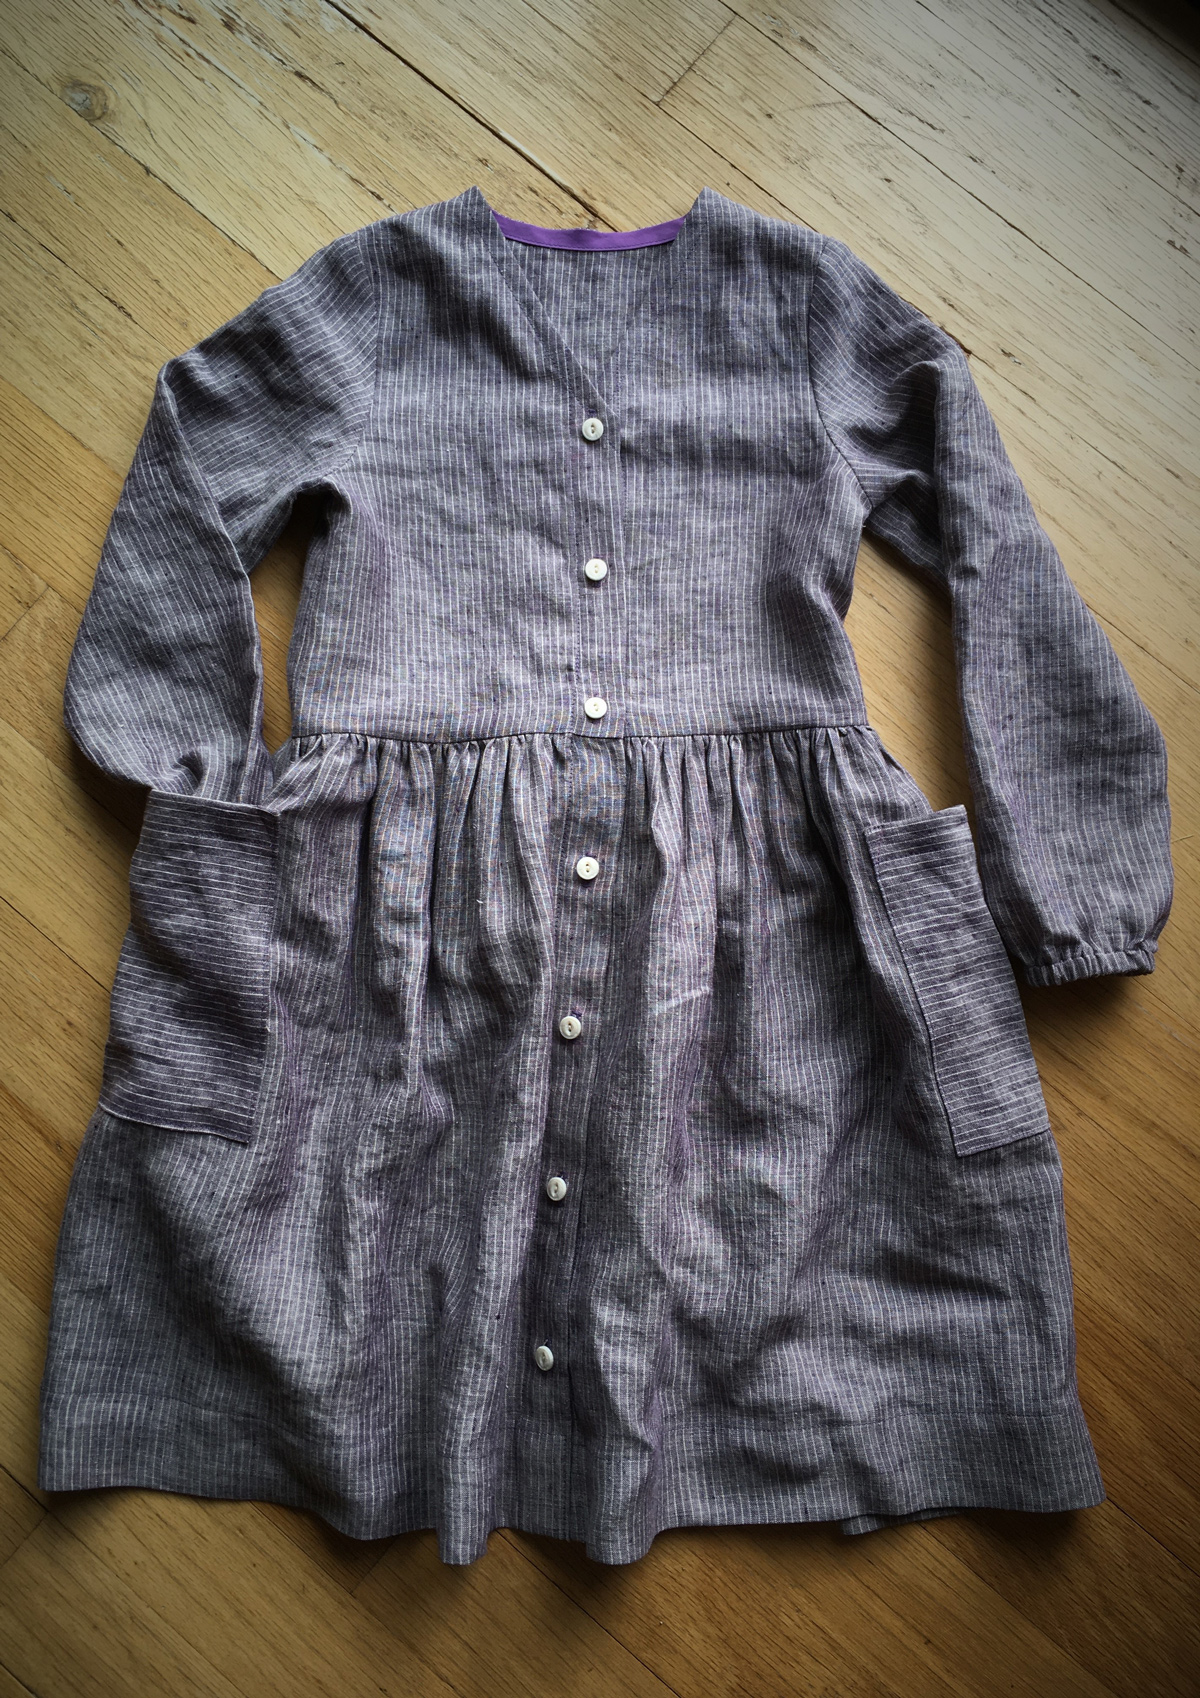 Lisa's MinLisa's Mini Darling Ranges dressi Darling Ranges dress